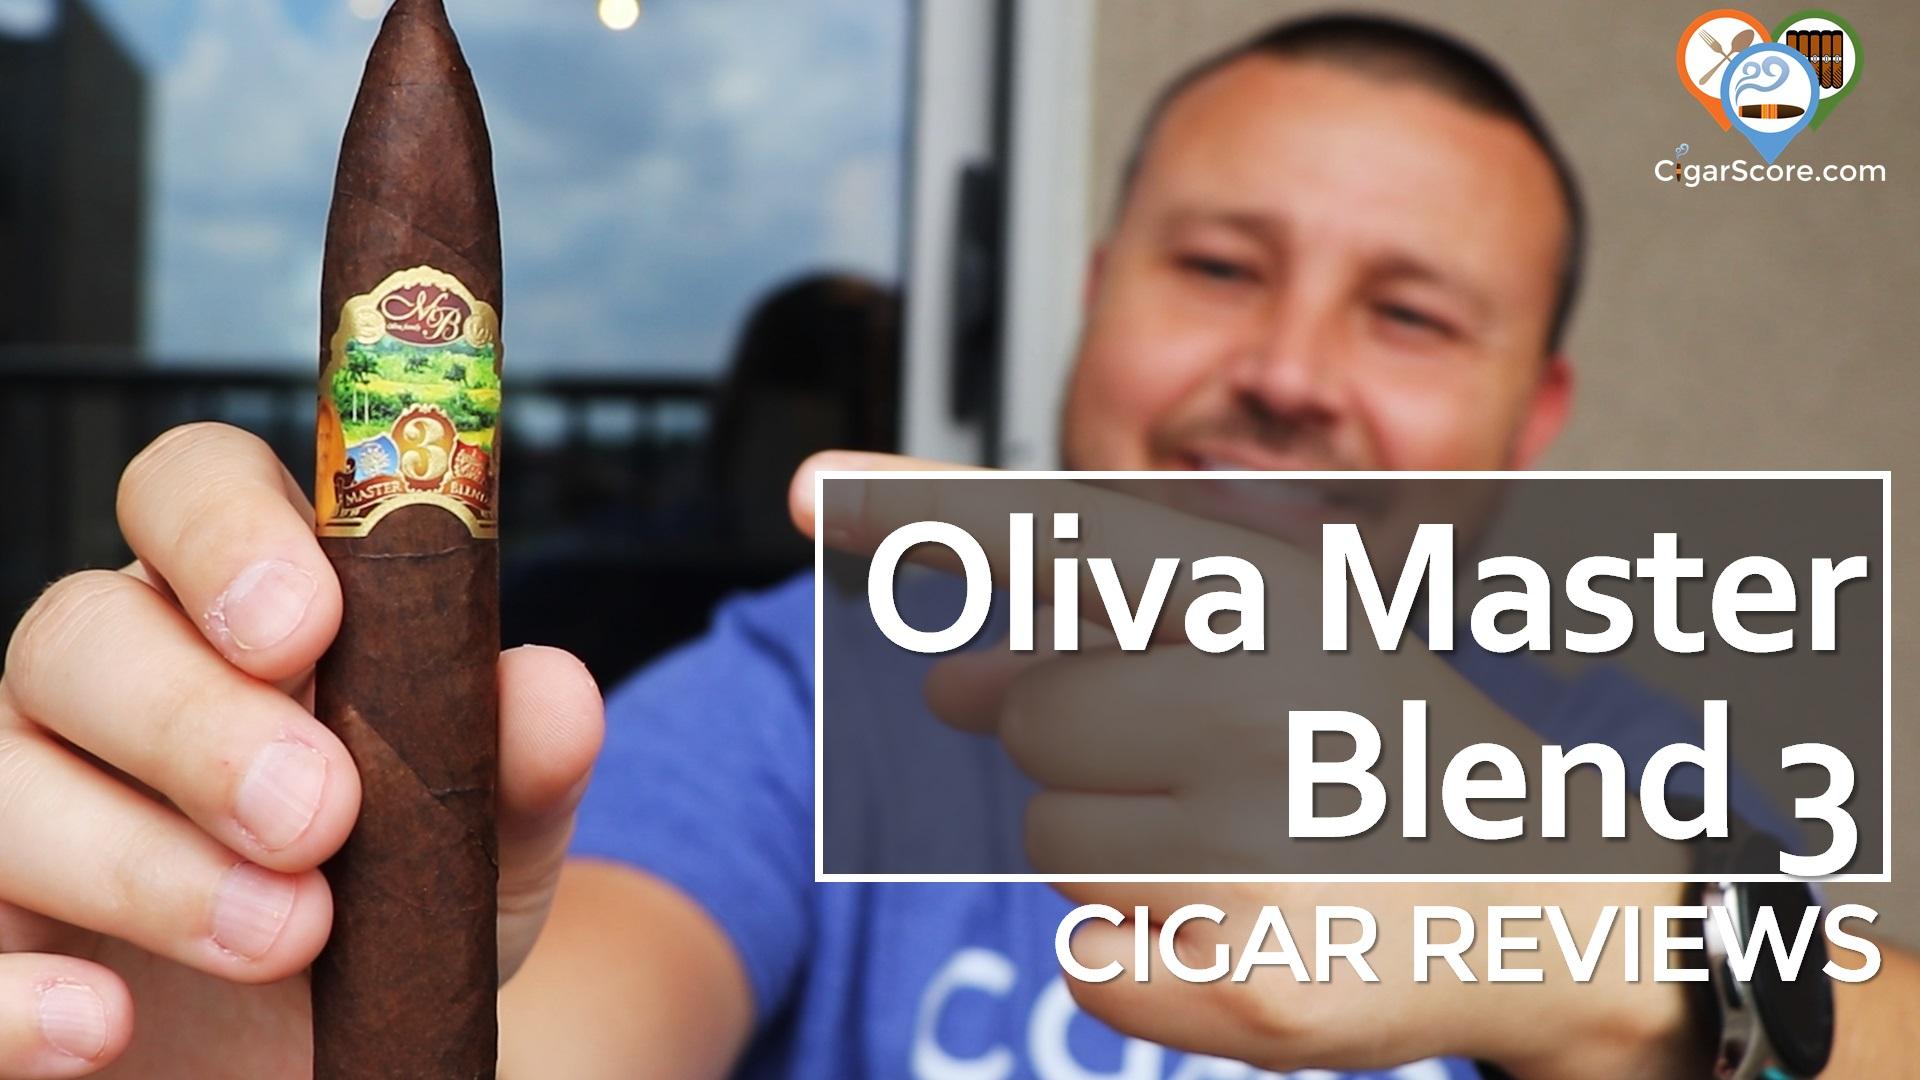 oliva master blend 3 cigar review